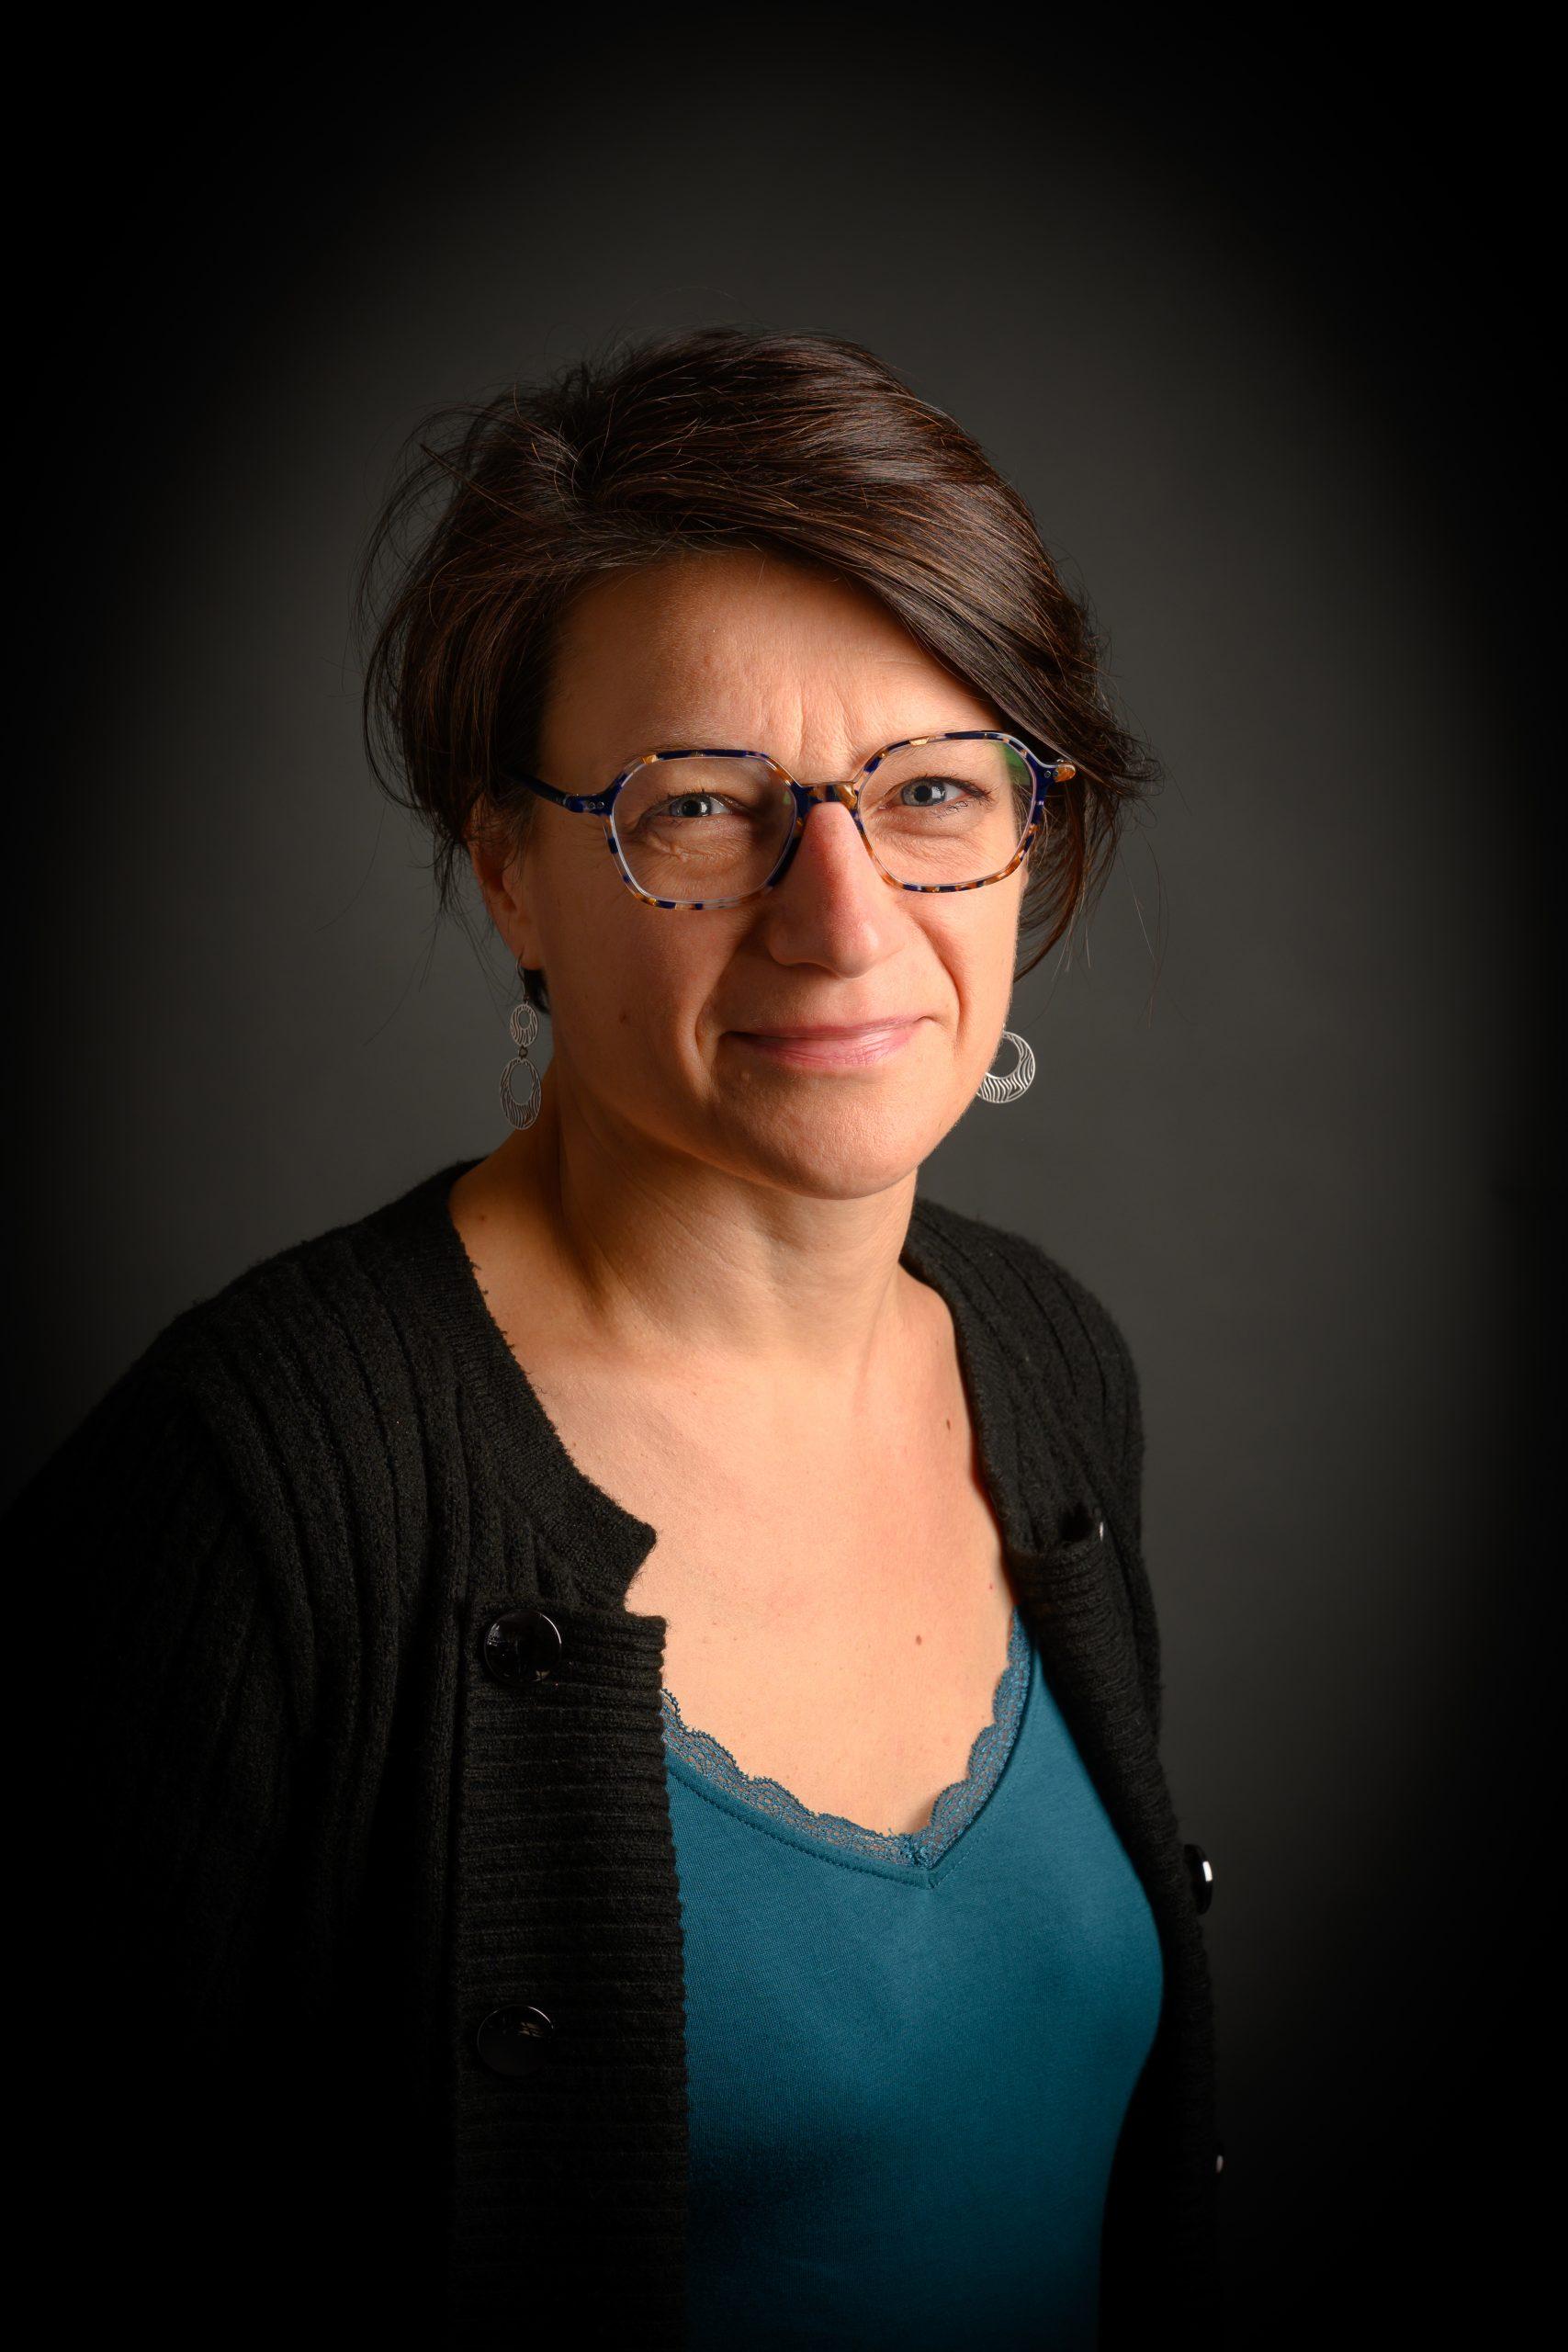 Chantal Dorriere